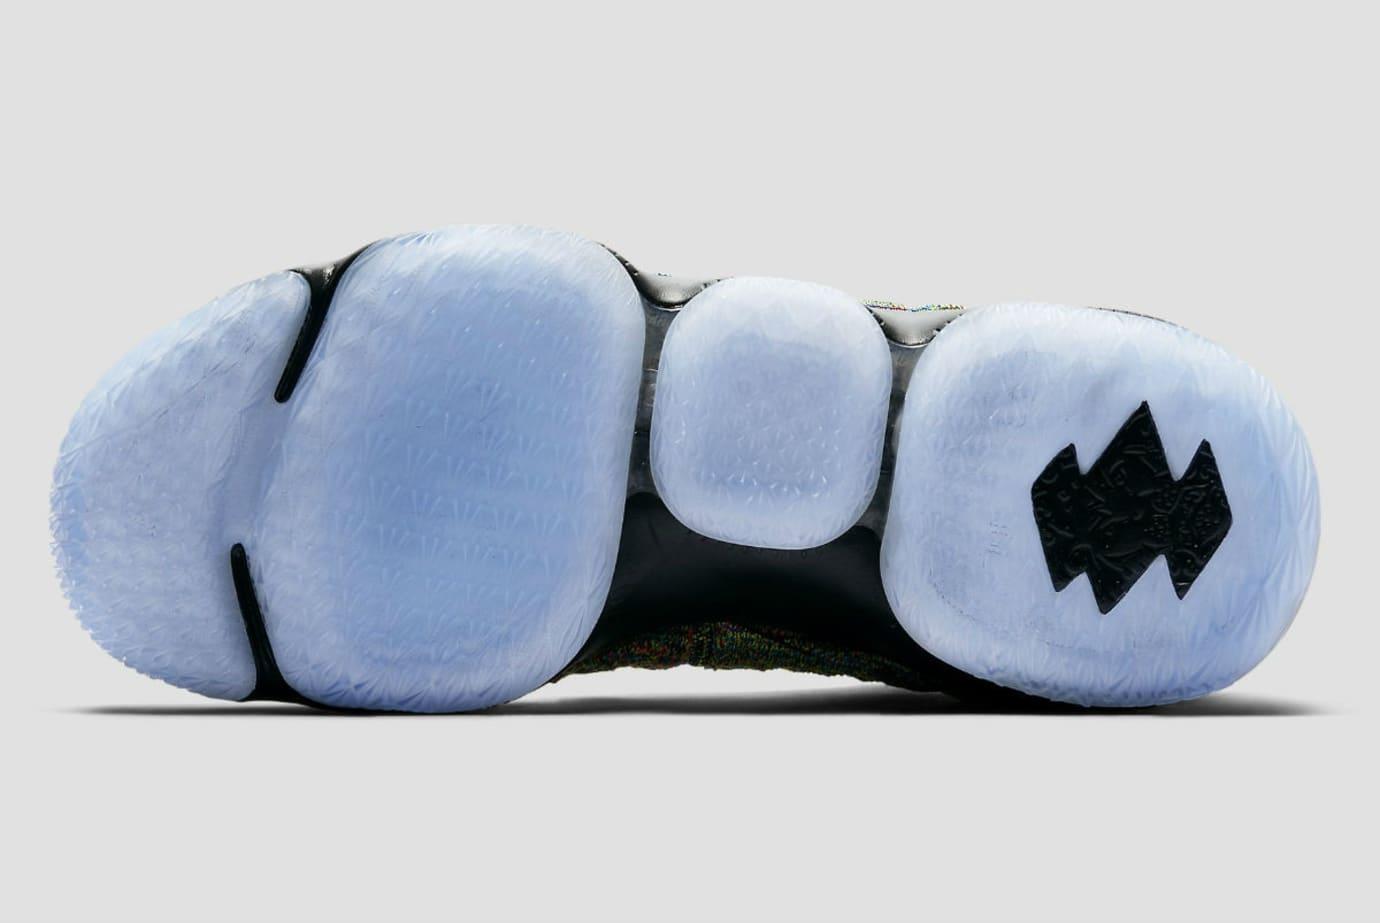 3a588be090e3be Nike LeBron 15 XV Four Horsemen Black Fruity Pebbles Release Date 897648-901  Sole